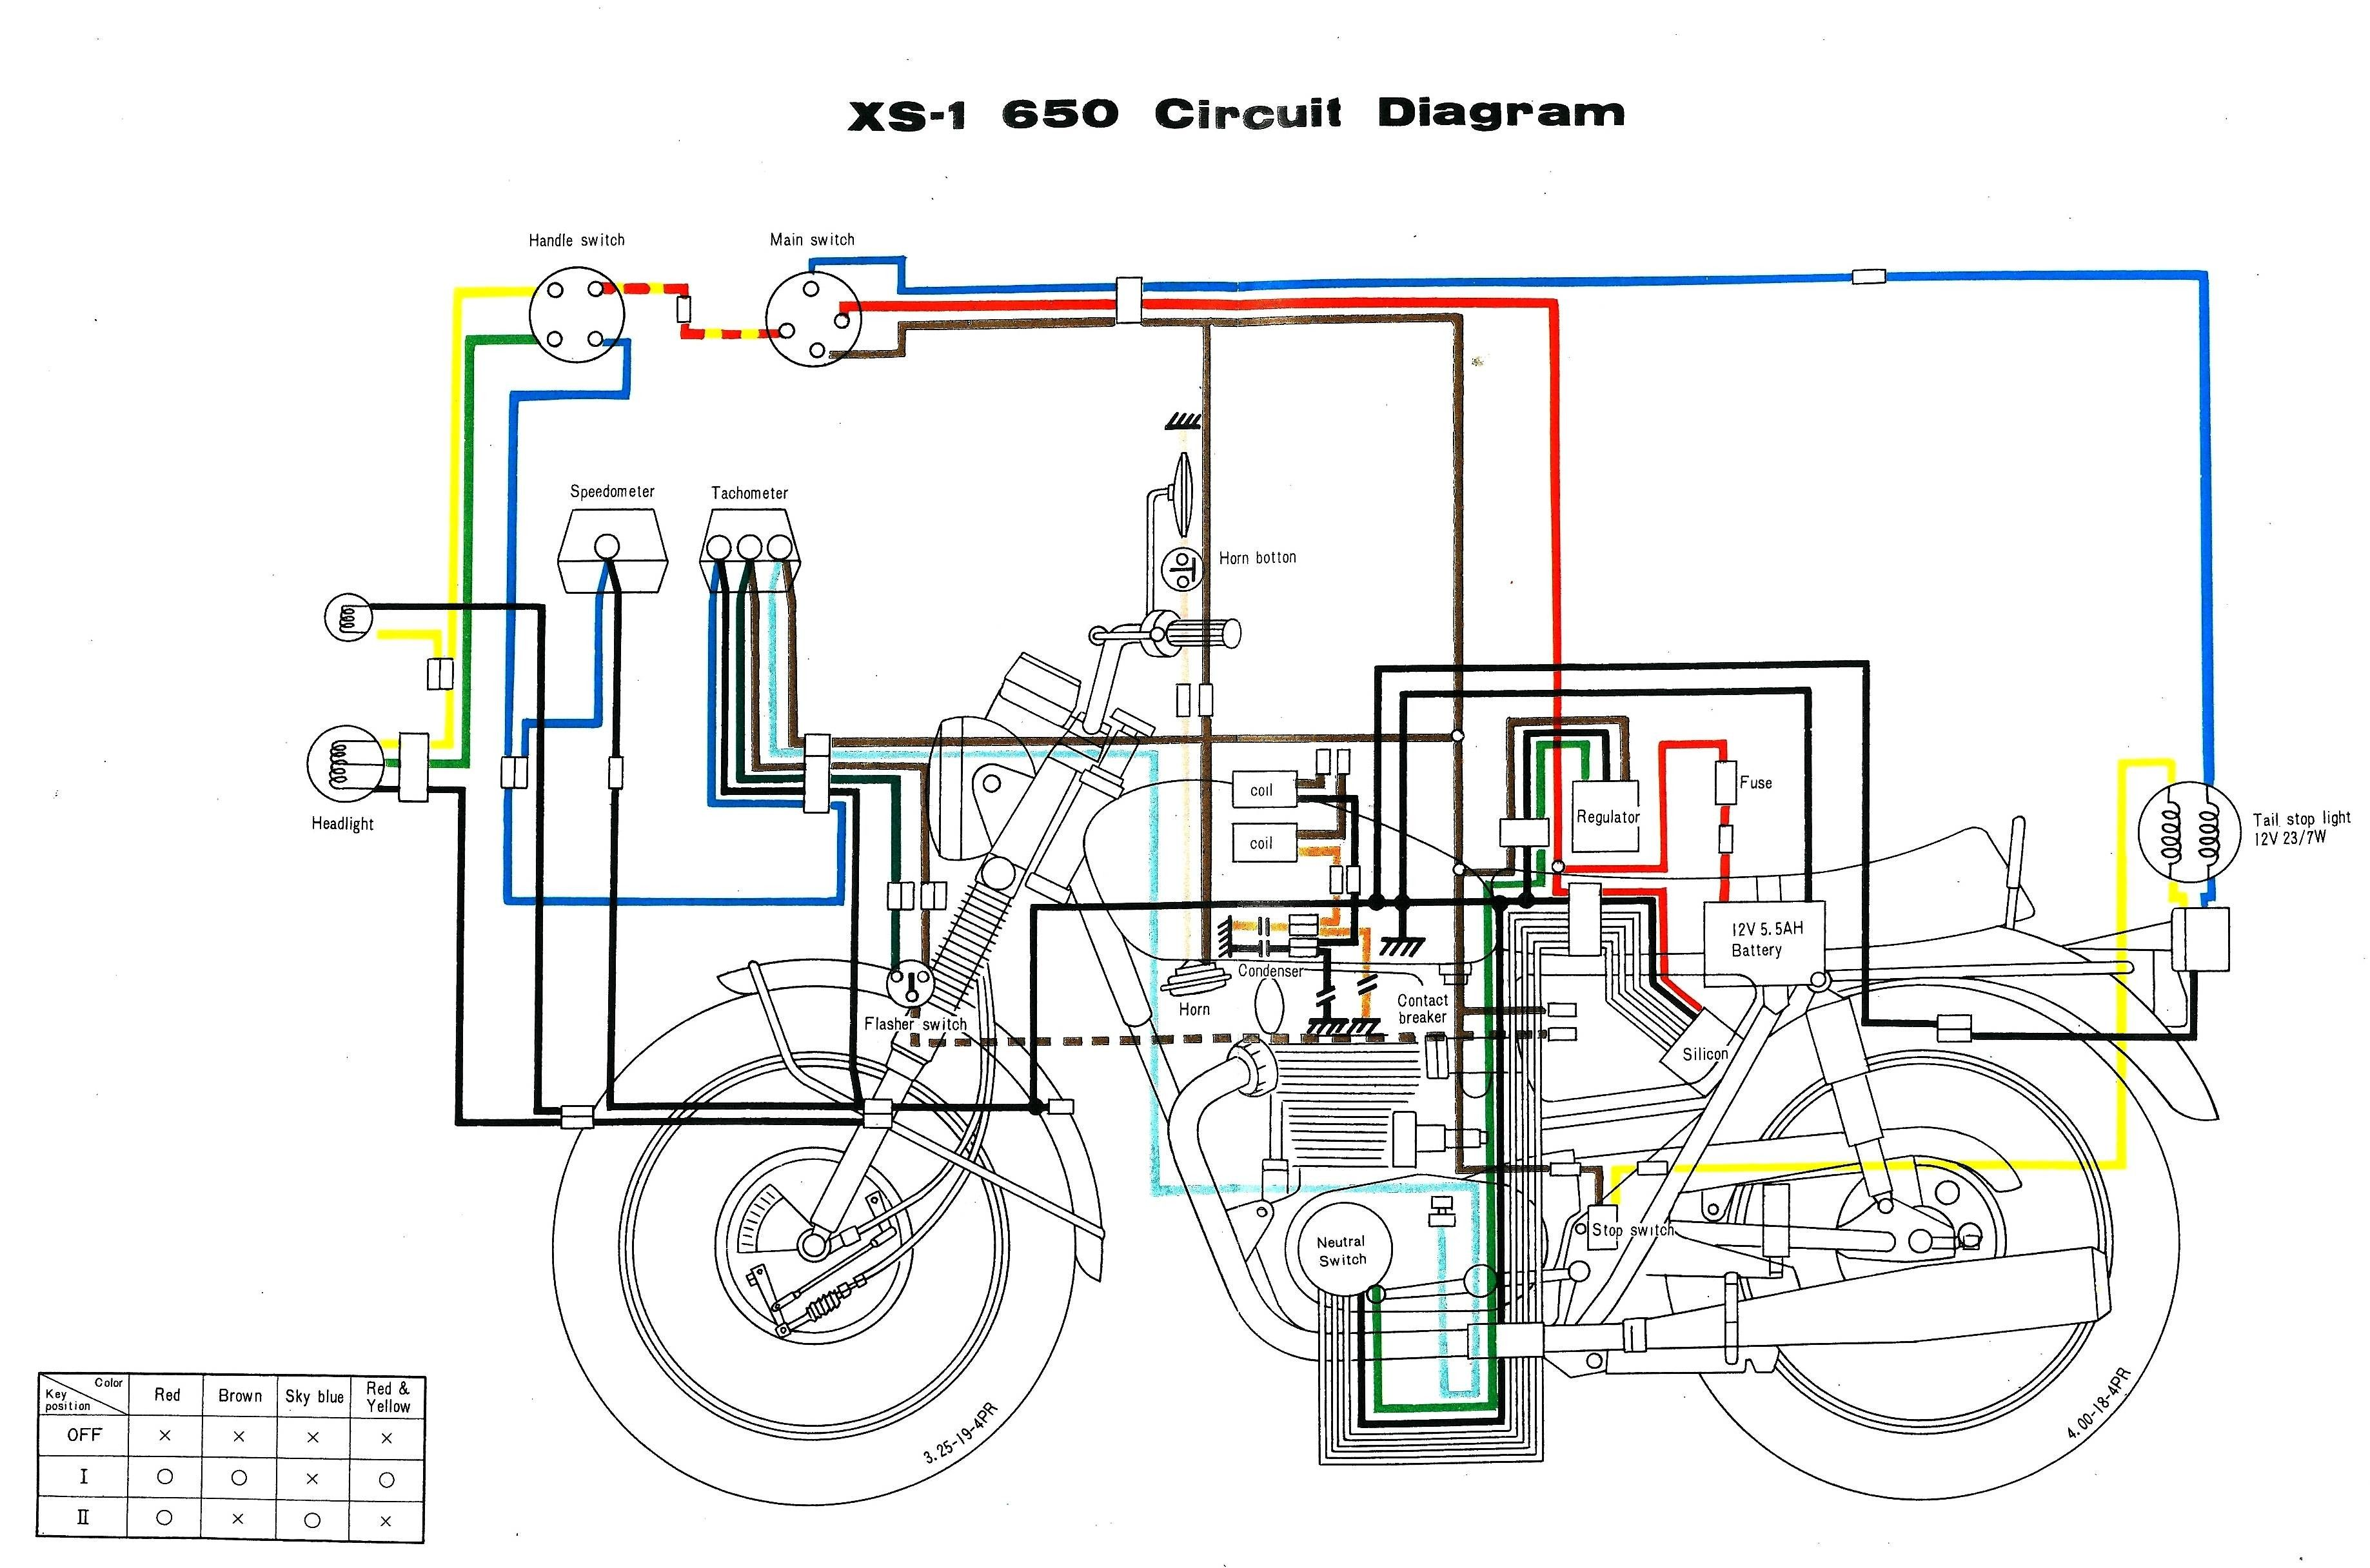 New Electrician Diagram Diagram Wiringdiagram Diagramming Diagramm Visuals Visualisation Graphical Generator Diagram Mesin